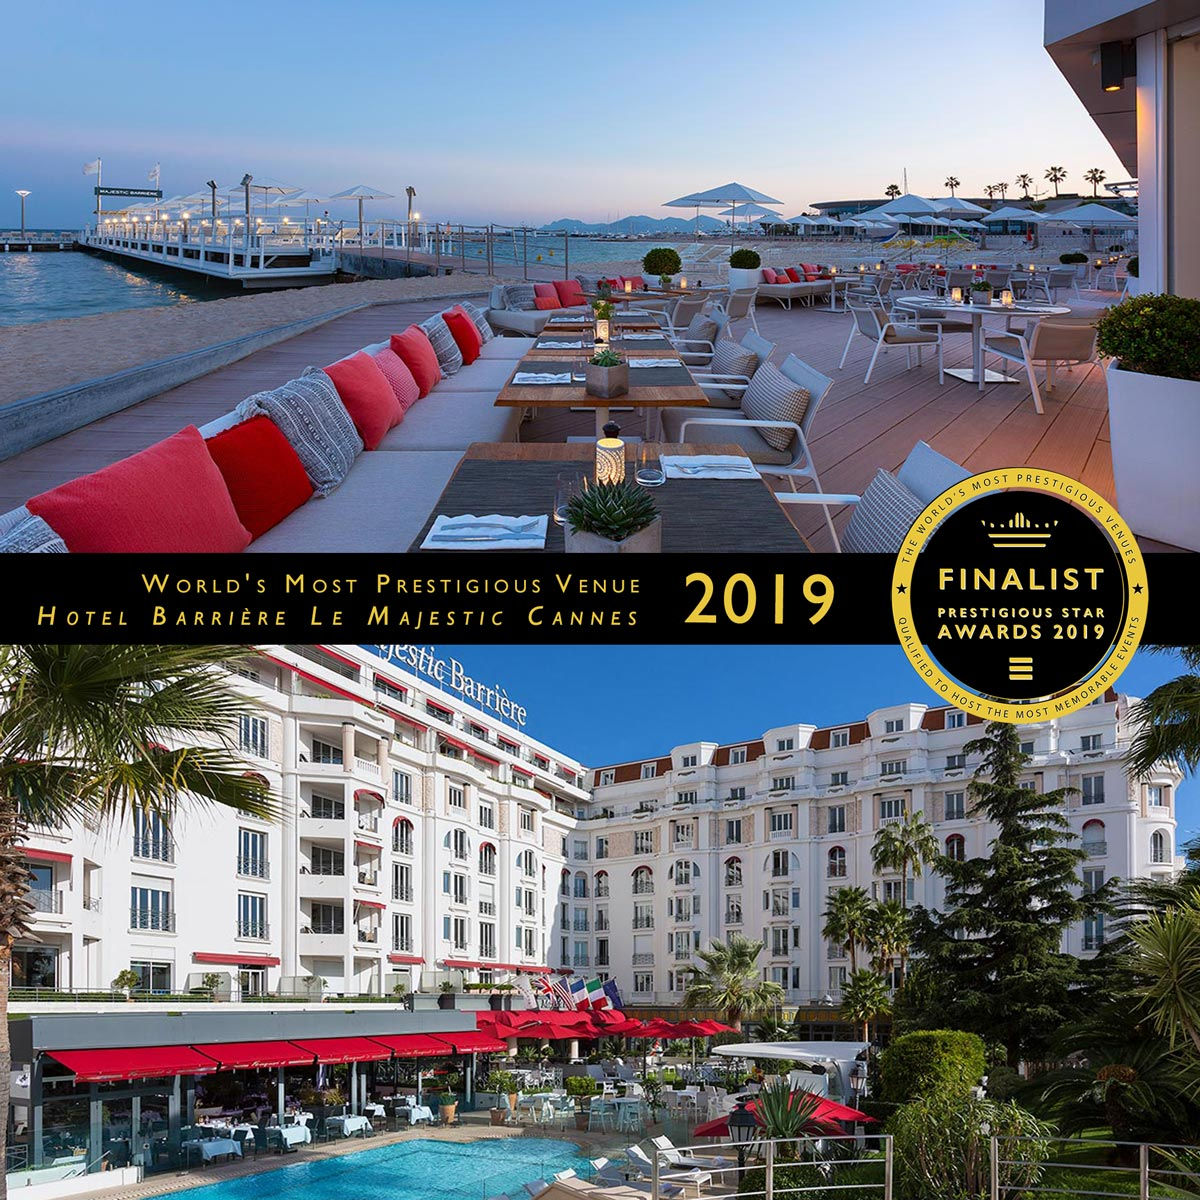 Christian Dior Suite at Hotel Barrière Le Majestic Cannes